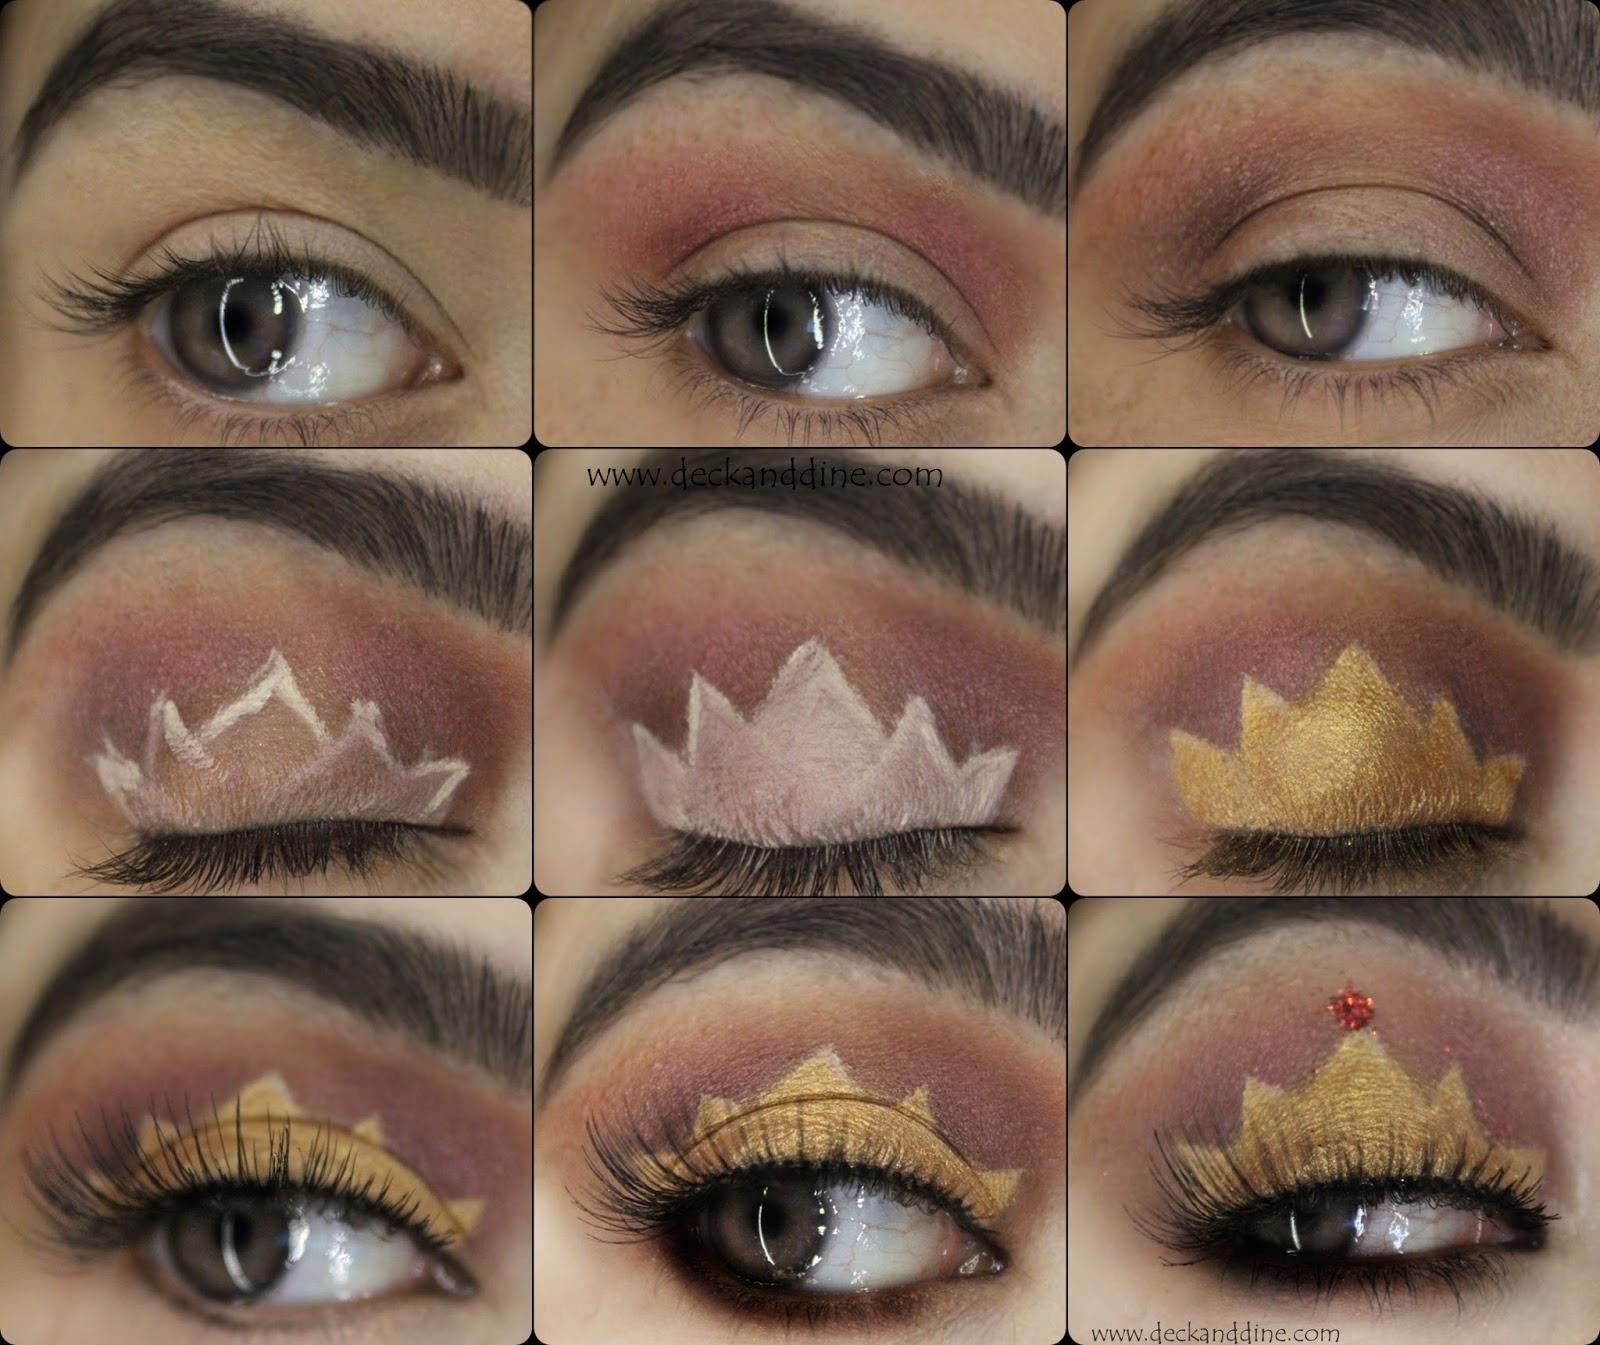 Princess Queen Crown Eye Makeup Step By Step Tutorial Deck And Dine